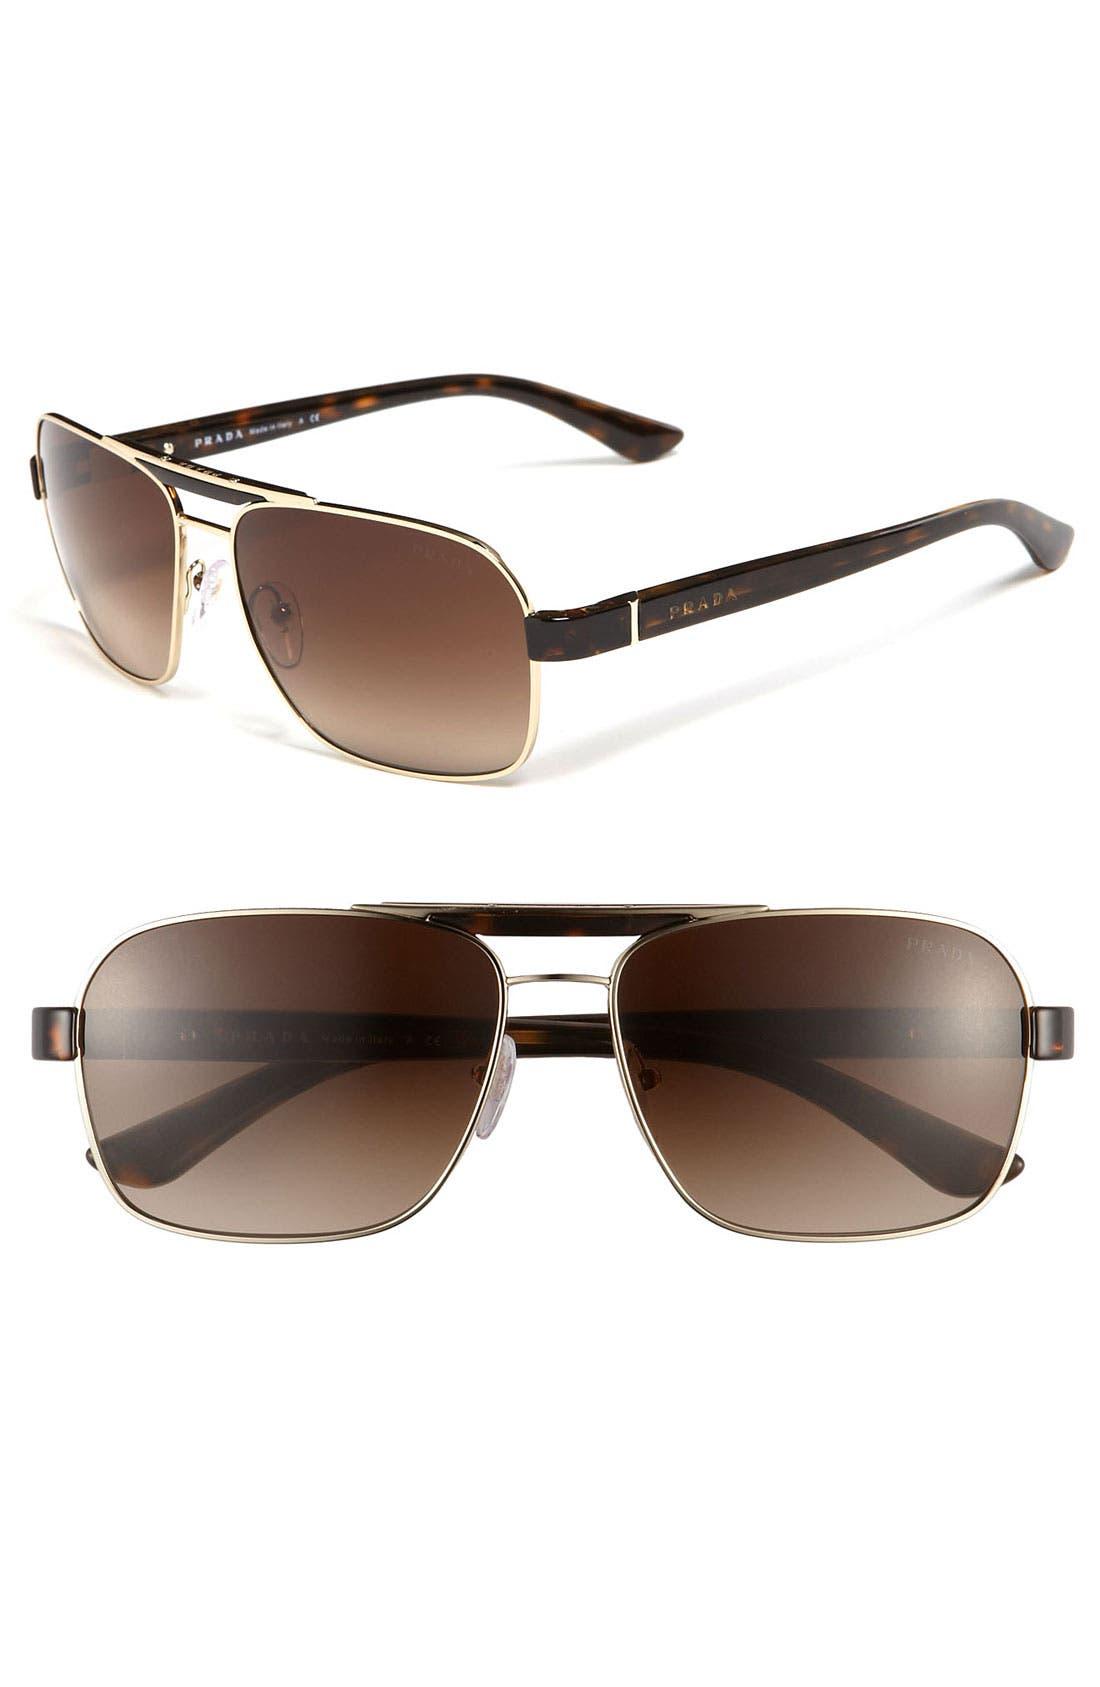 Main Image - Prada 60mm Aviator Sunglasses